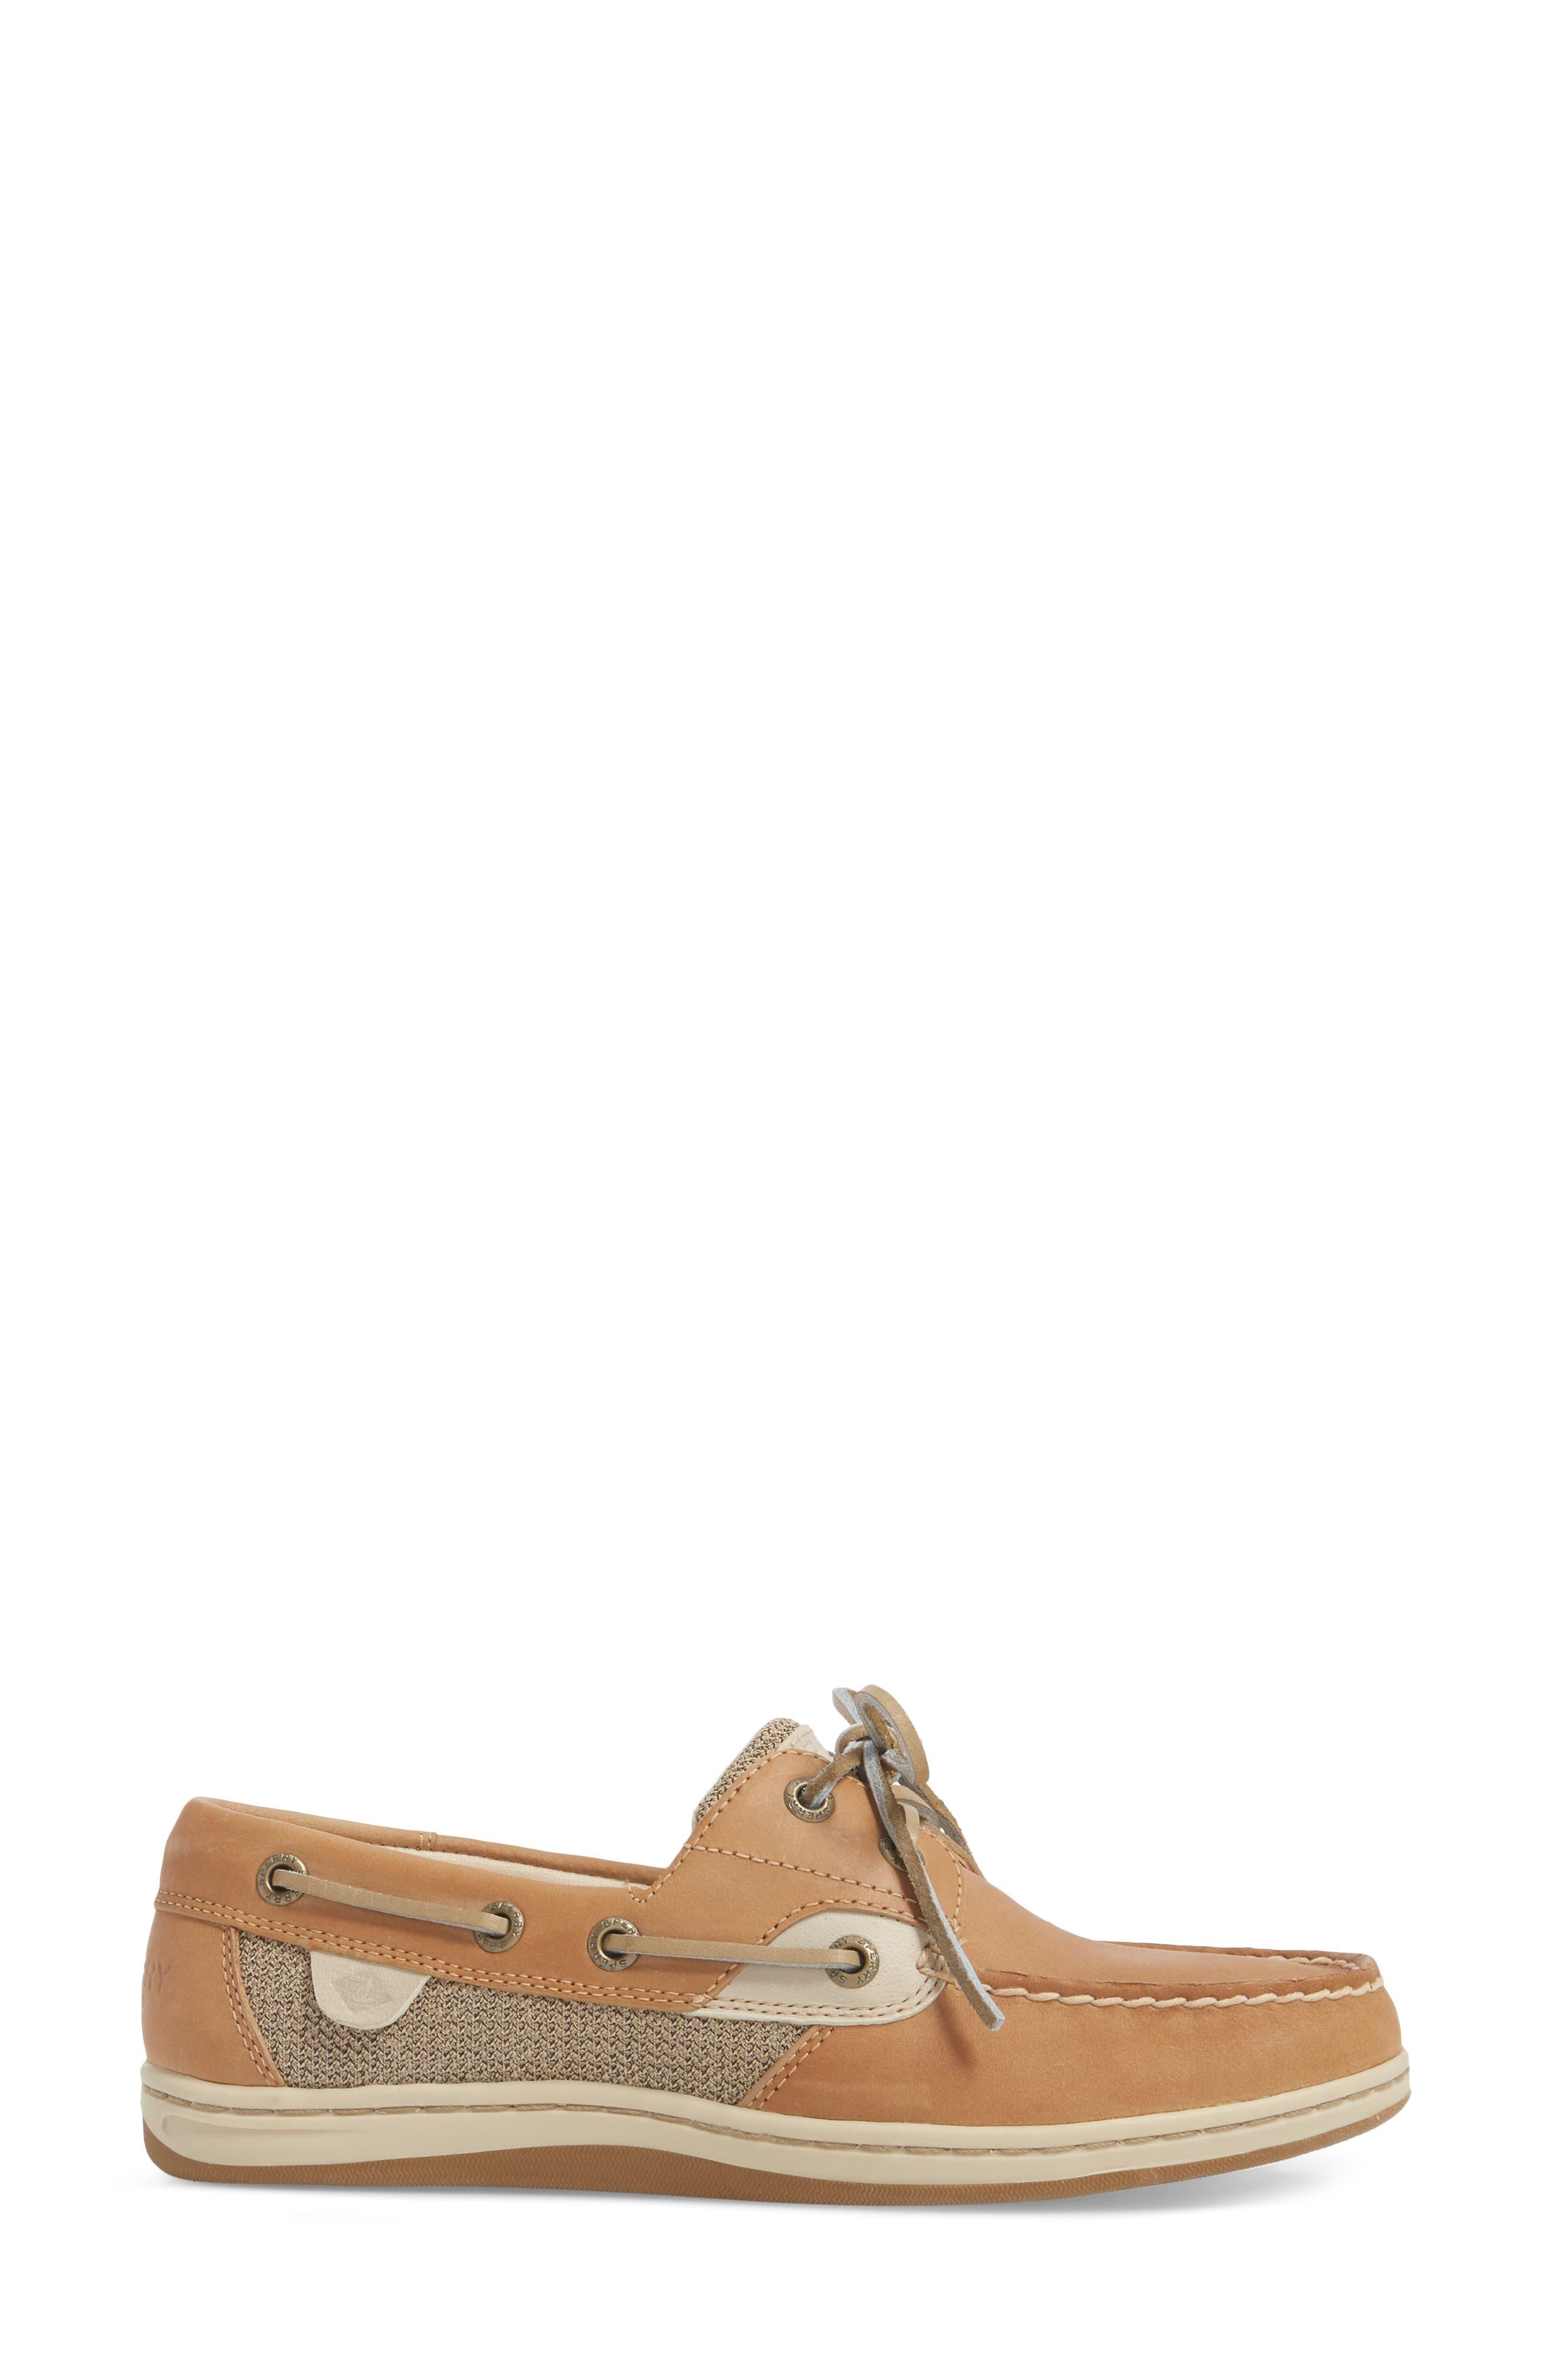 Top-Sider Koifish Loafer,                             Alternate thumbnail 3, color,                             Linen Oat Leather